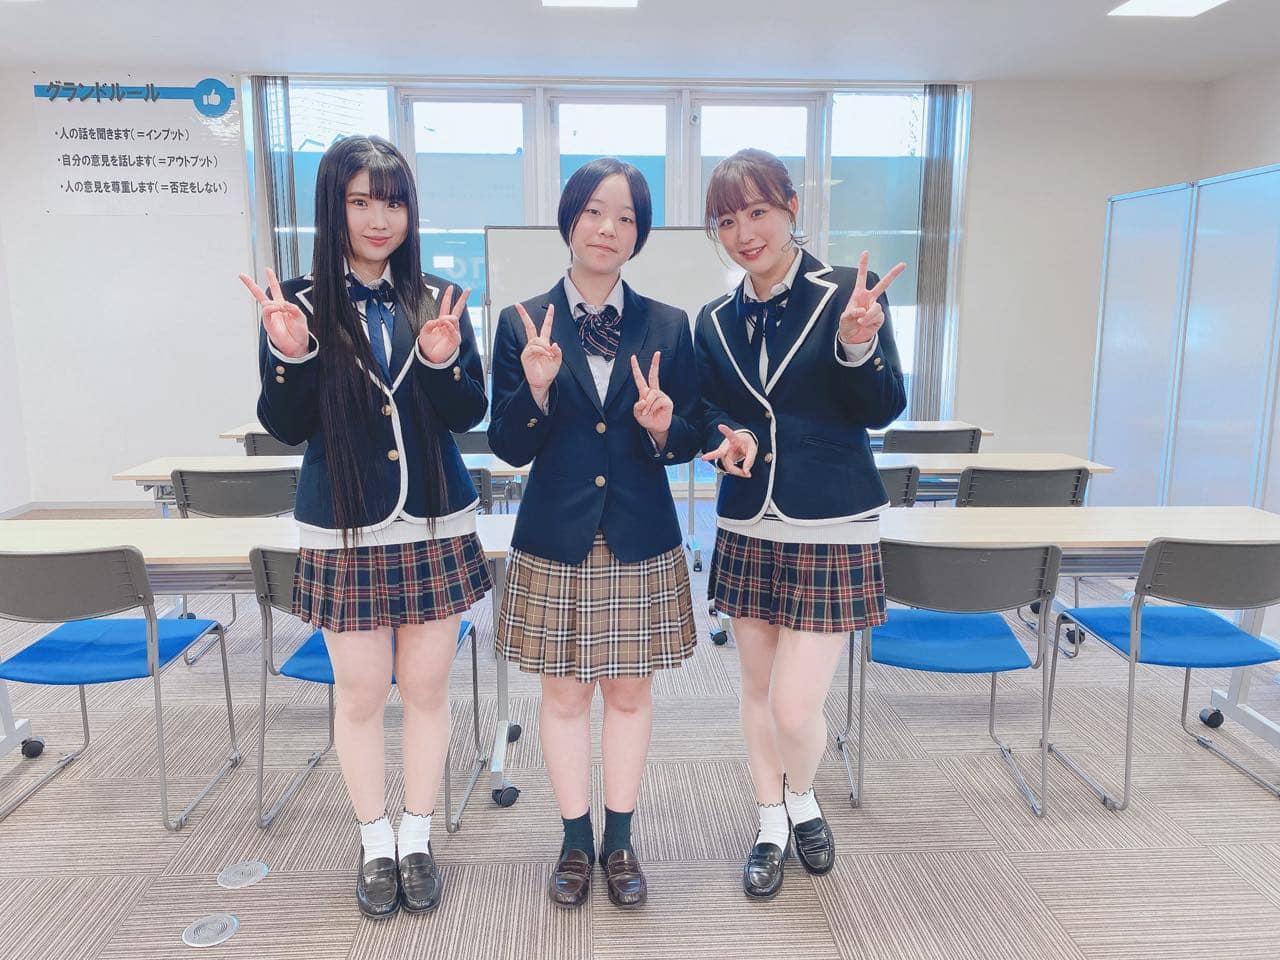 「SKE48は君と歌いたい」鎌田菜月&北川愛乃がKTCおおぞら高等学院岐阜キャンパスを訪れる②